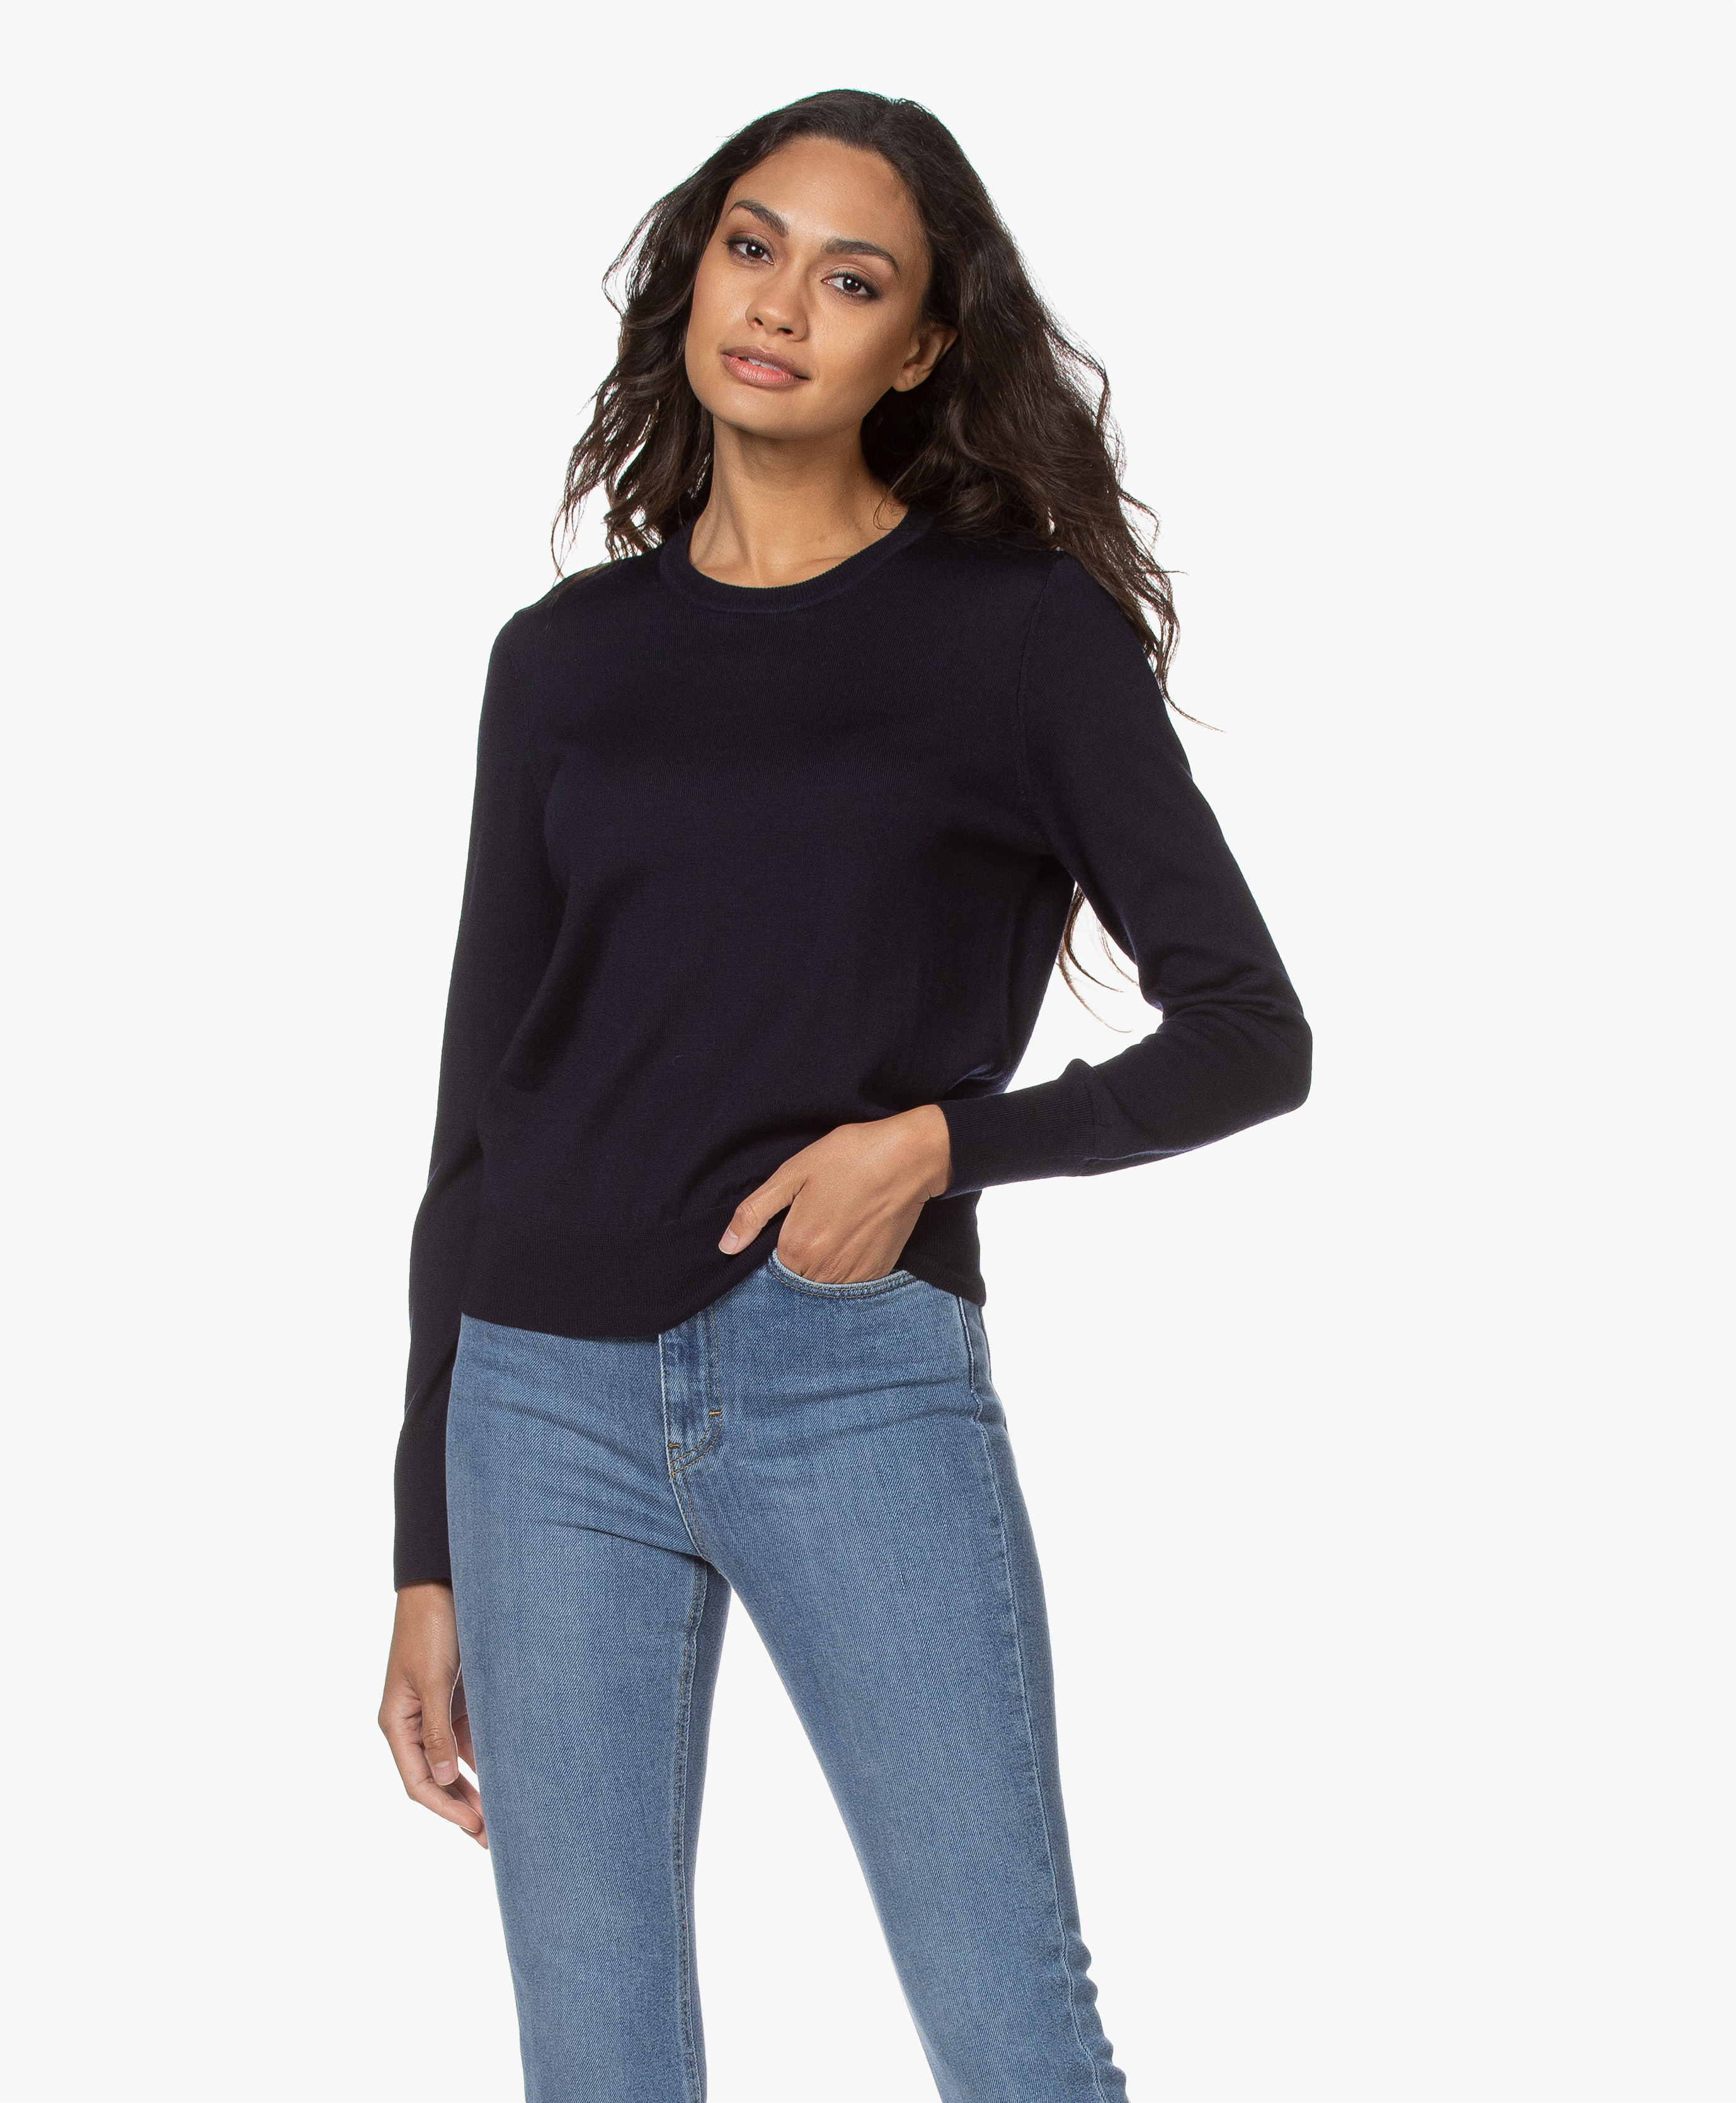 filippa k oversize pullover